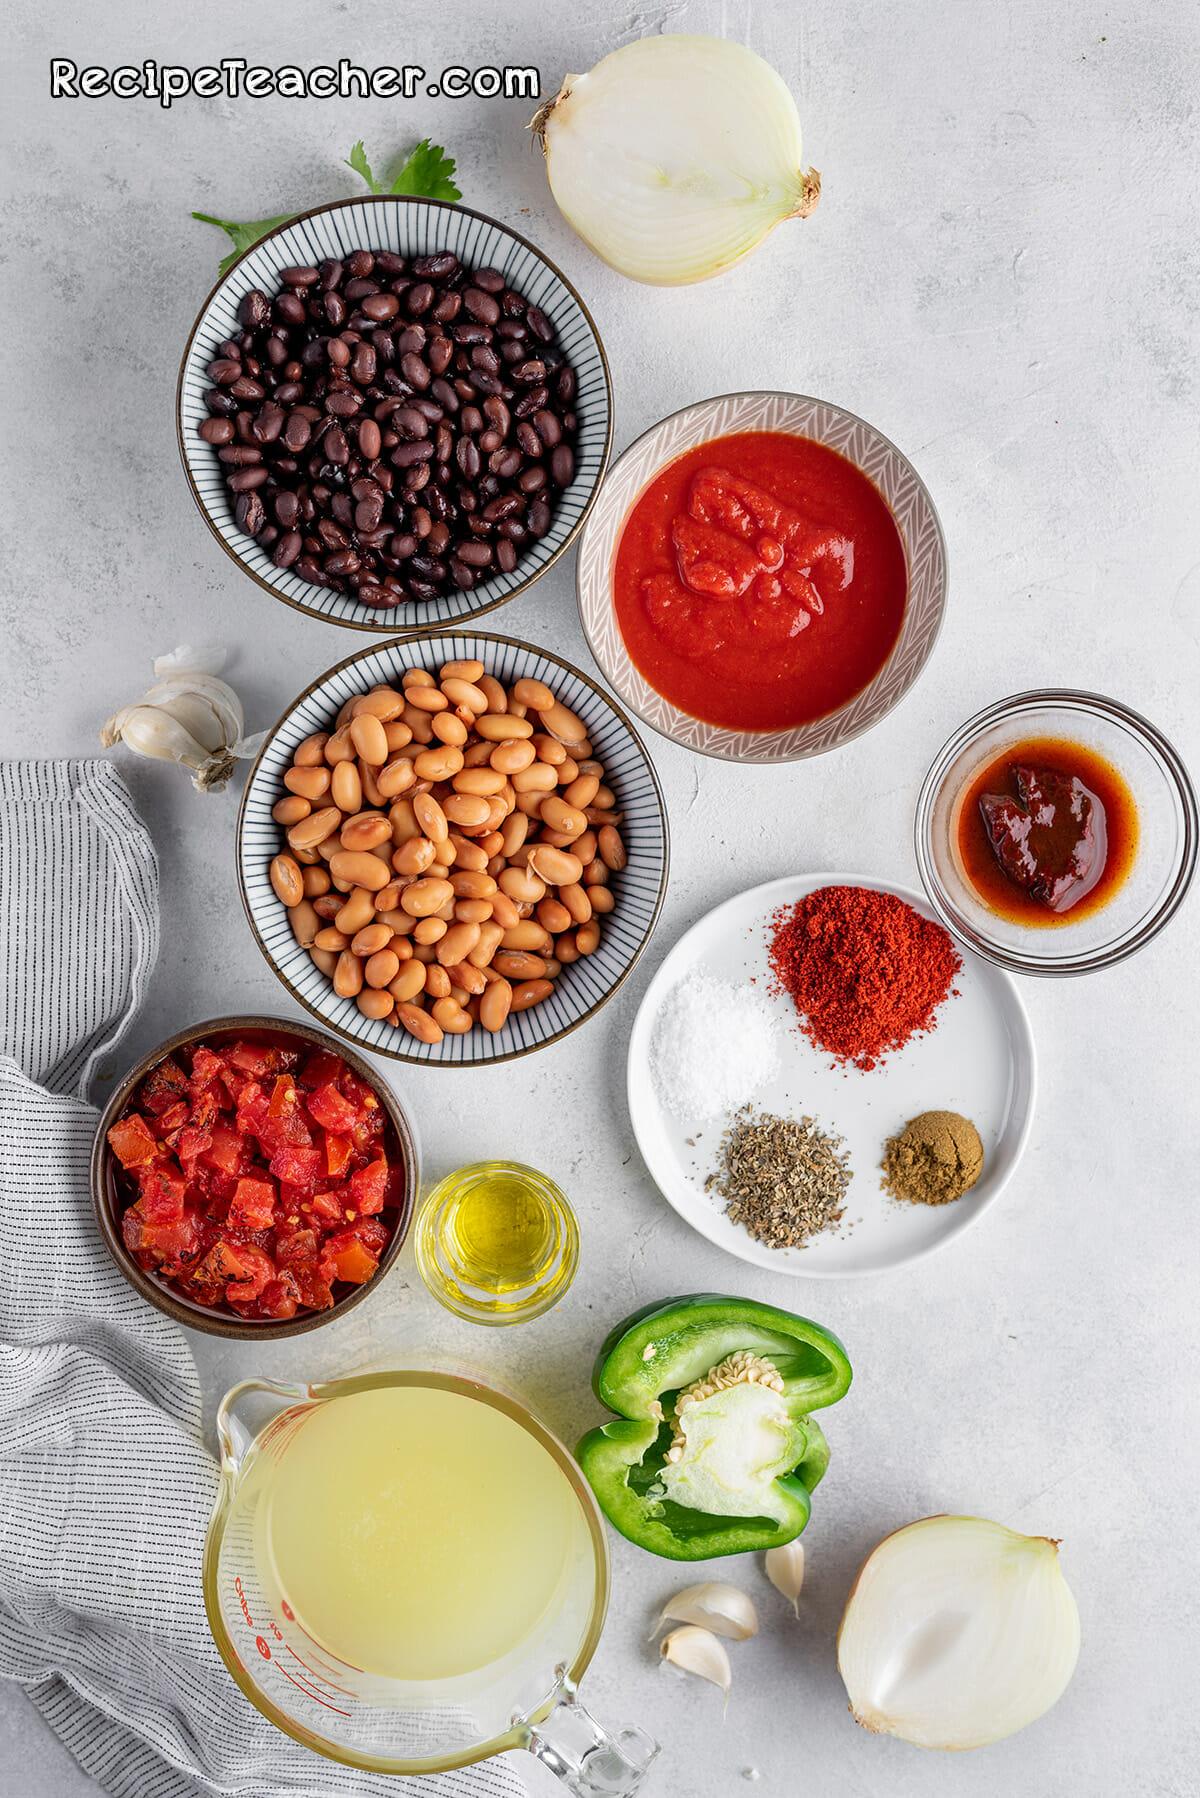 Ingredients for unbelievable Instant Pot vegetarian chili